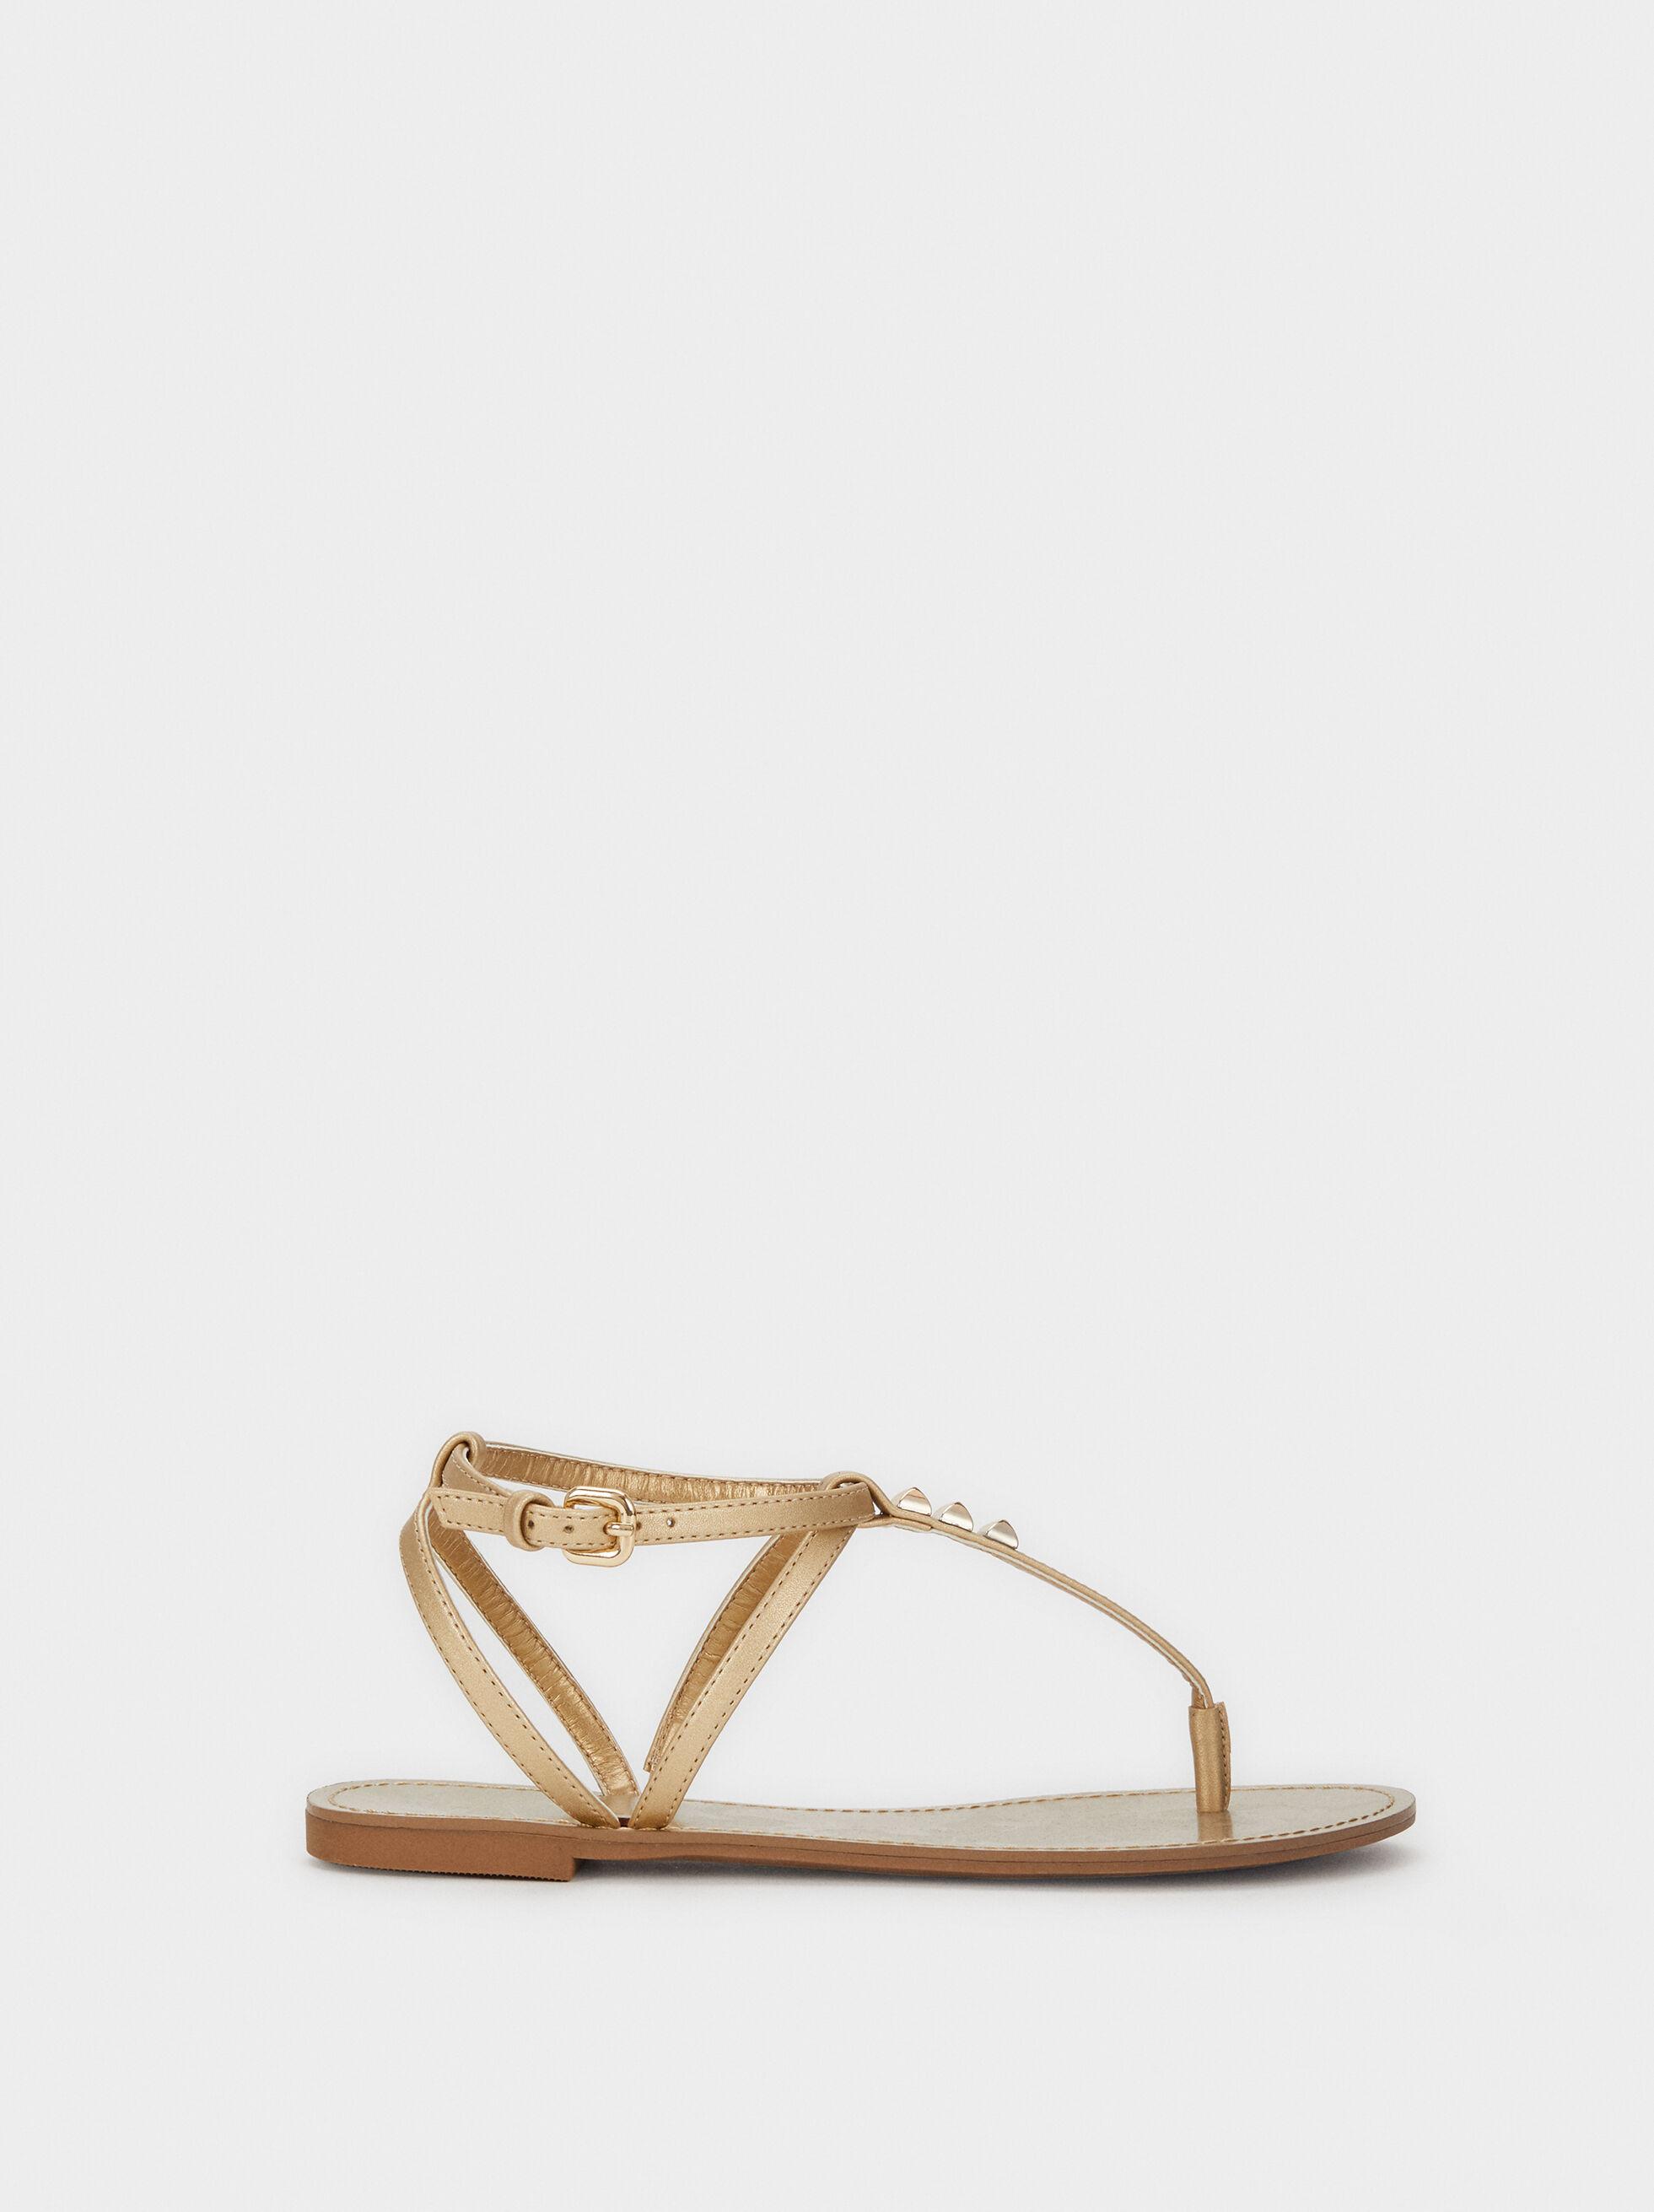 Flat Sandals With Stud Details, Golden, hi-res